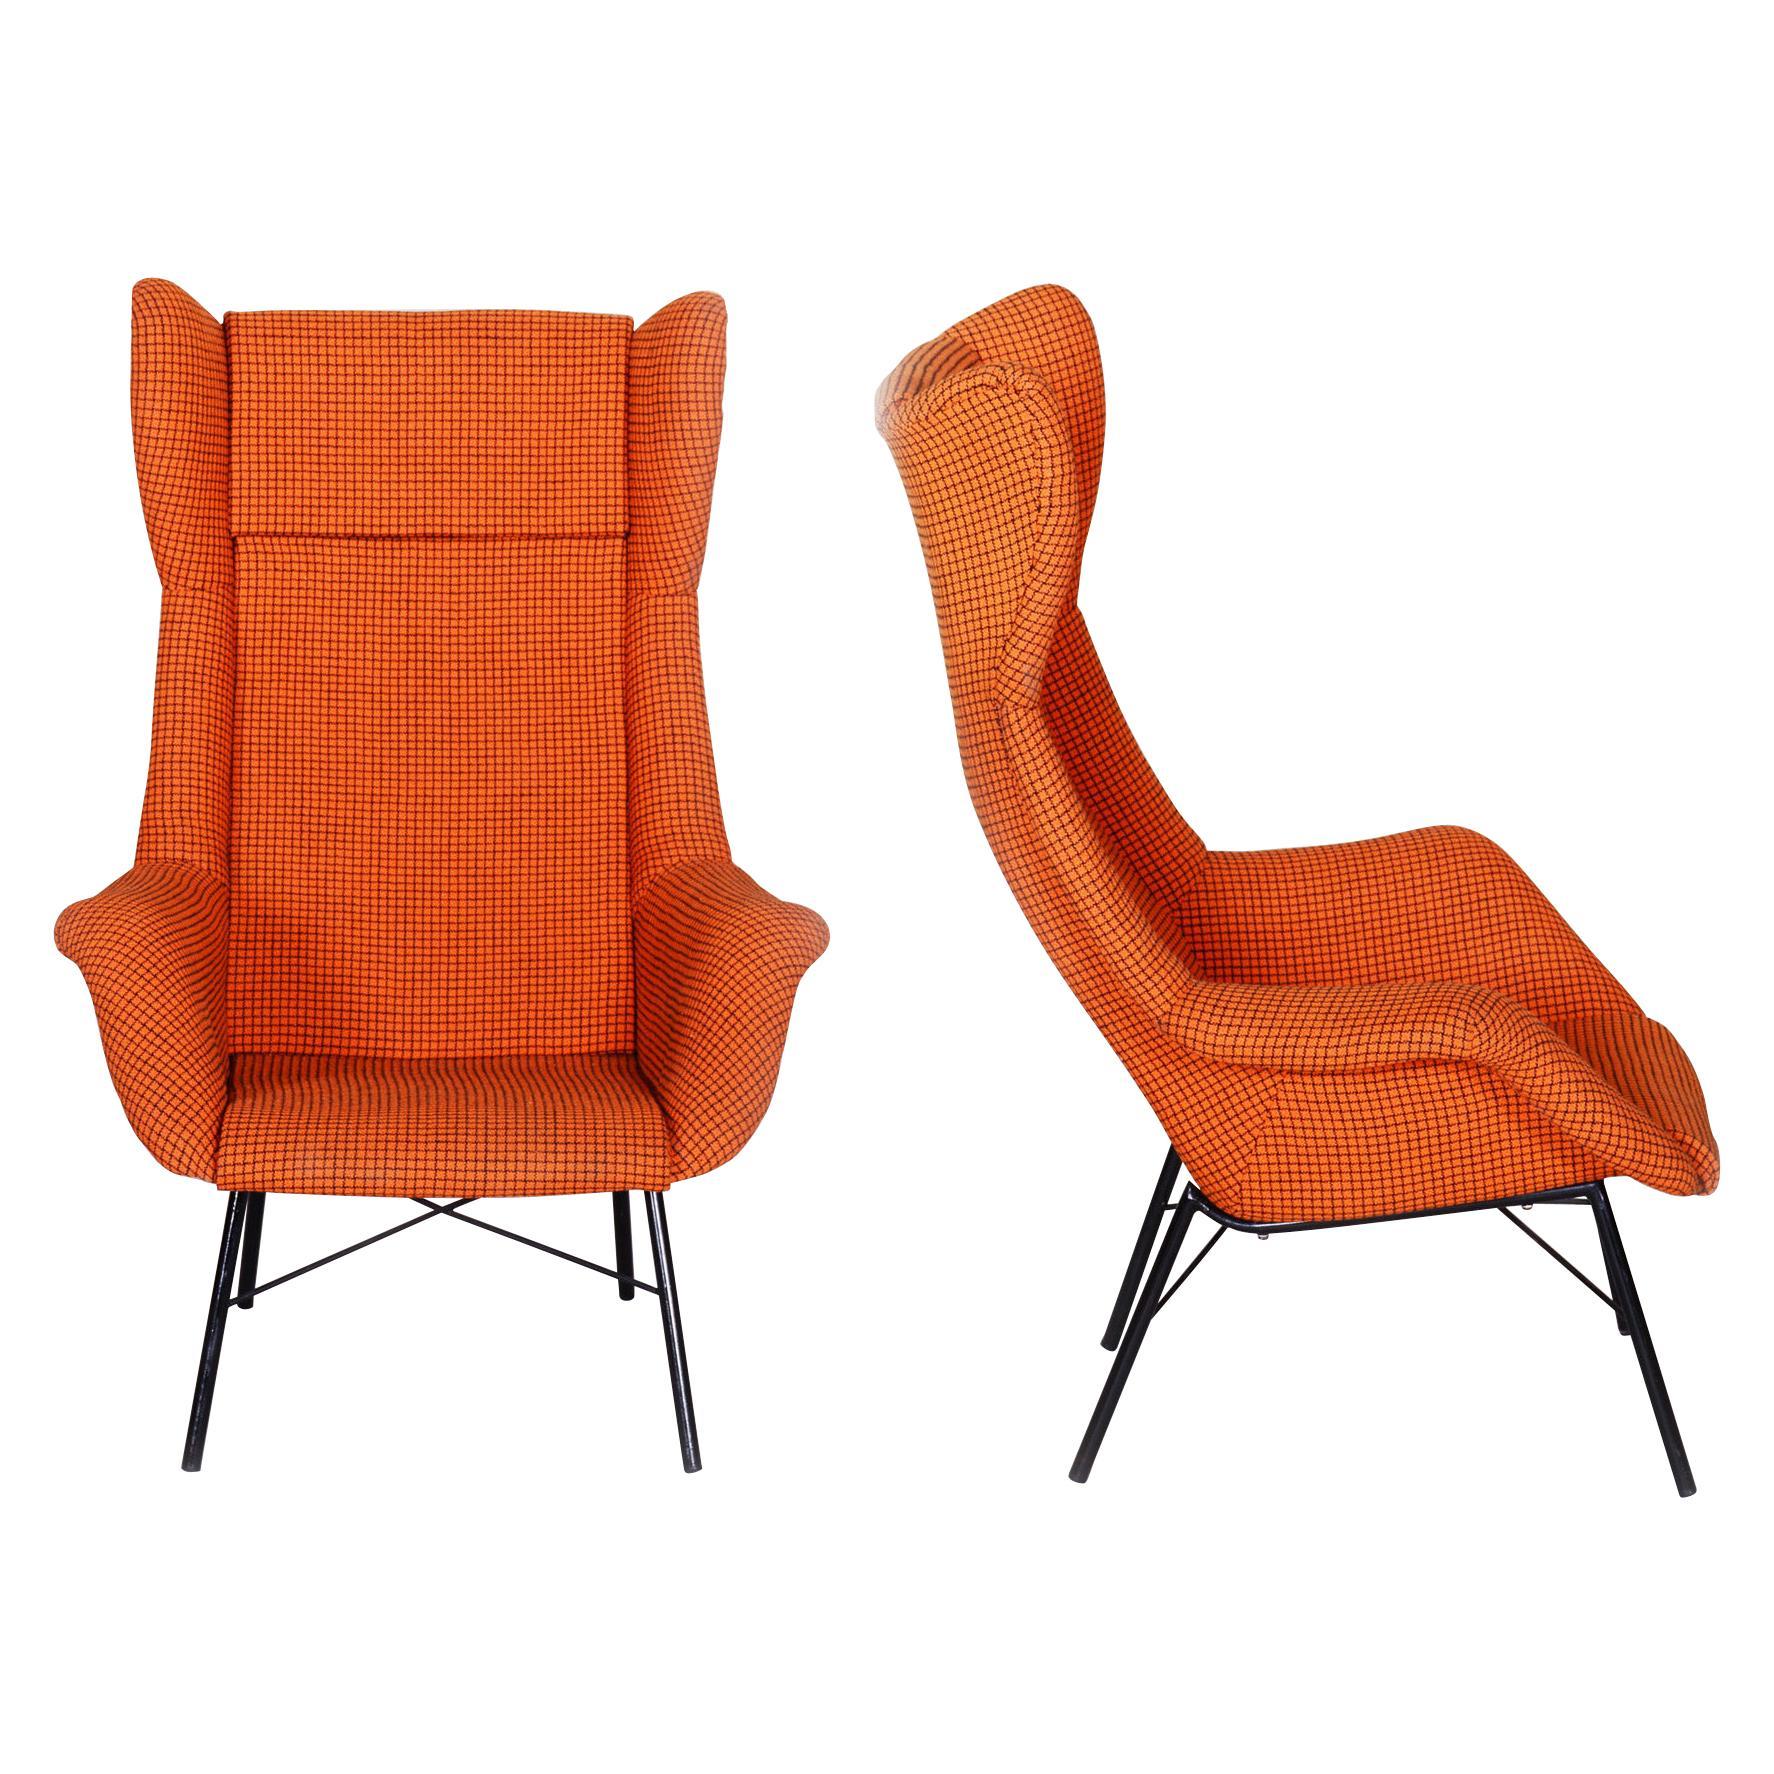 Restored Pair of Czechoslovakian Midcentury Armchairs, 1960s, Original Fabric